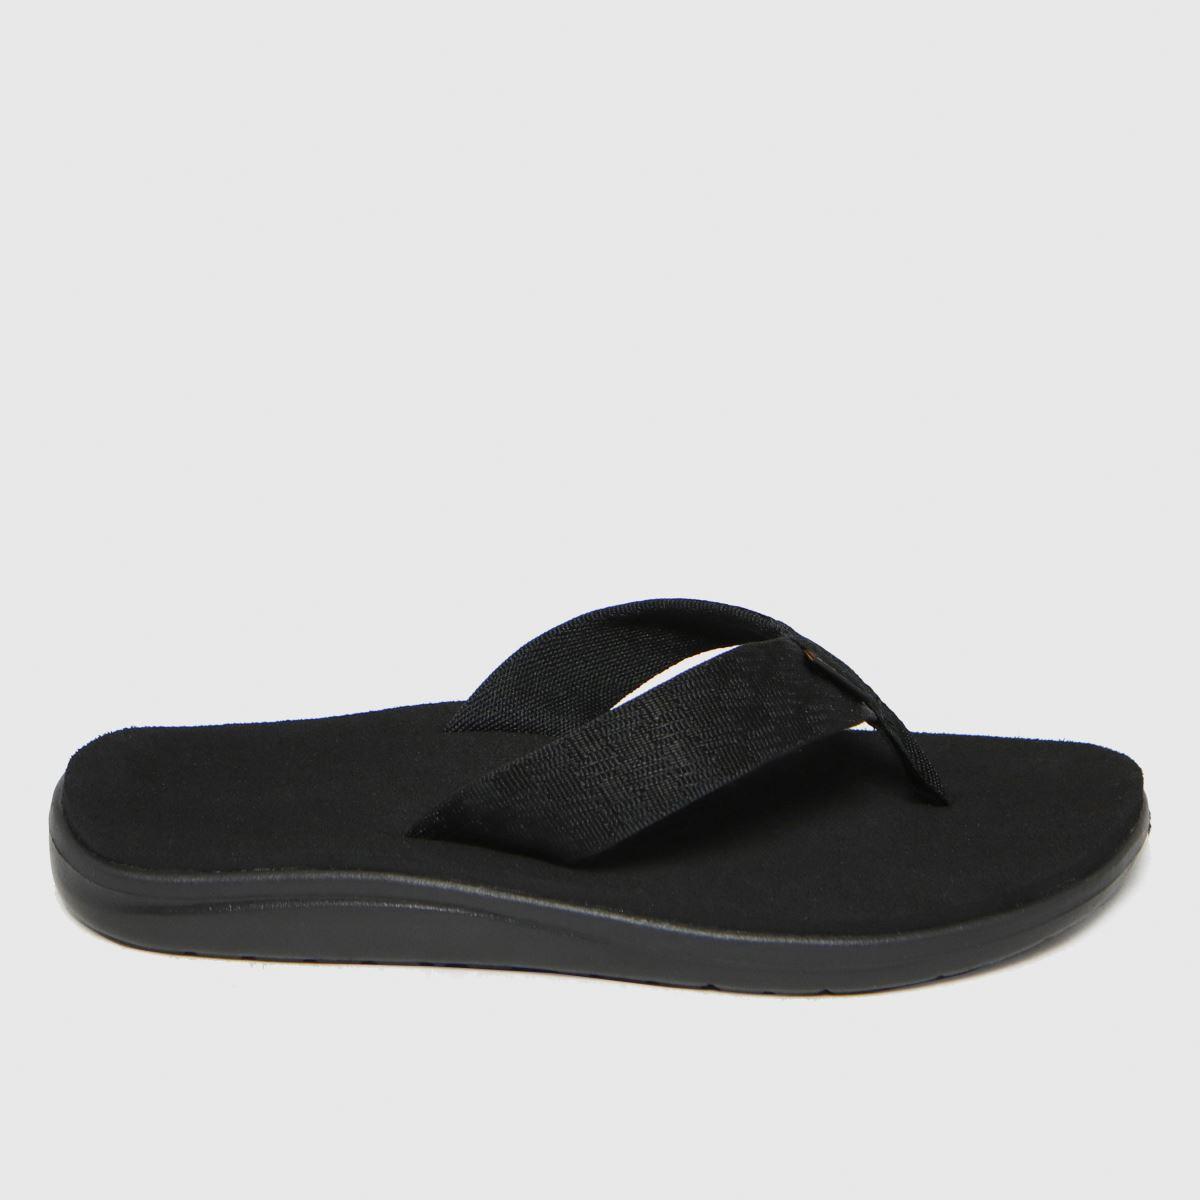 Teva Black Voya Flip Vegan Sandals